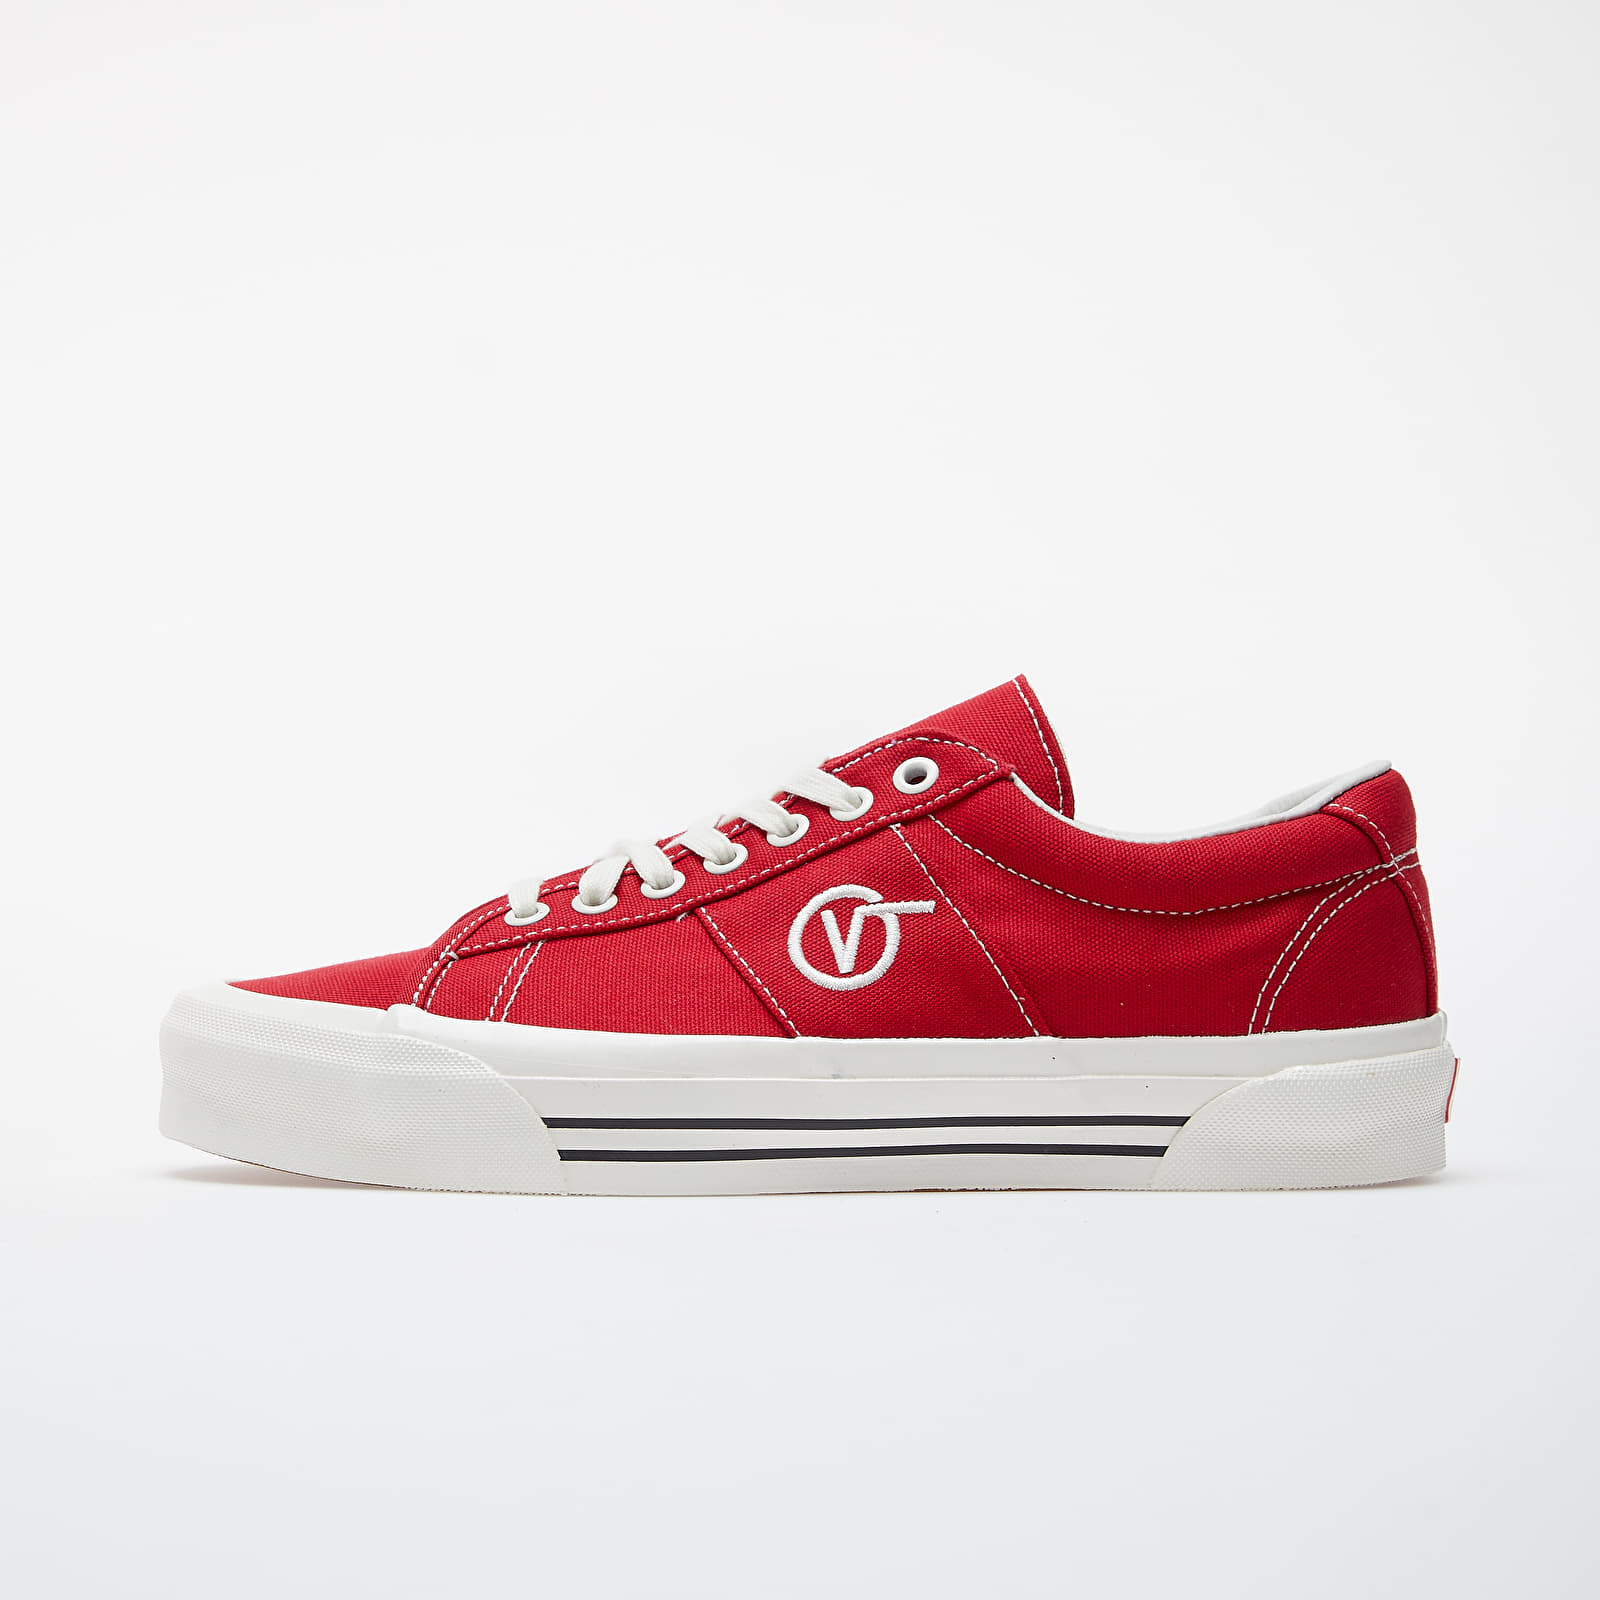 Pánské tenisky a boty Vans OG Sid LX (Canvas) Racing Red/ Marshmallow